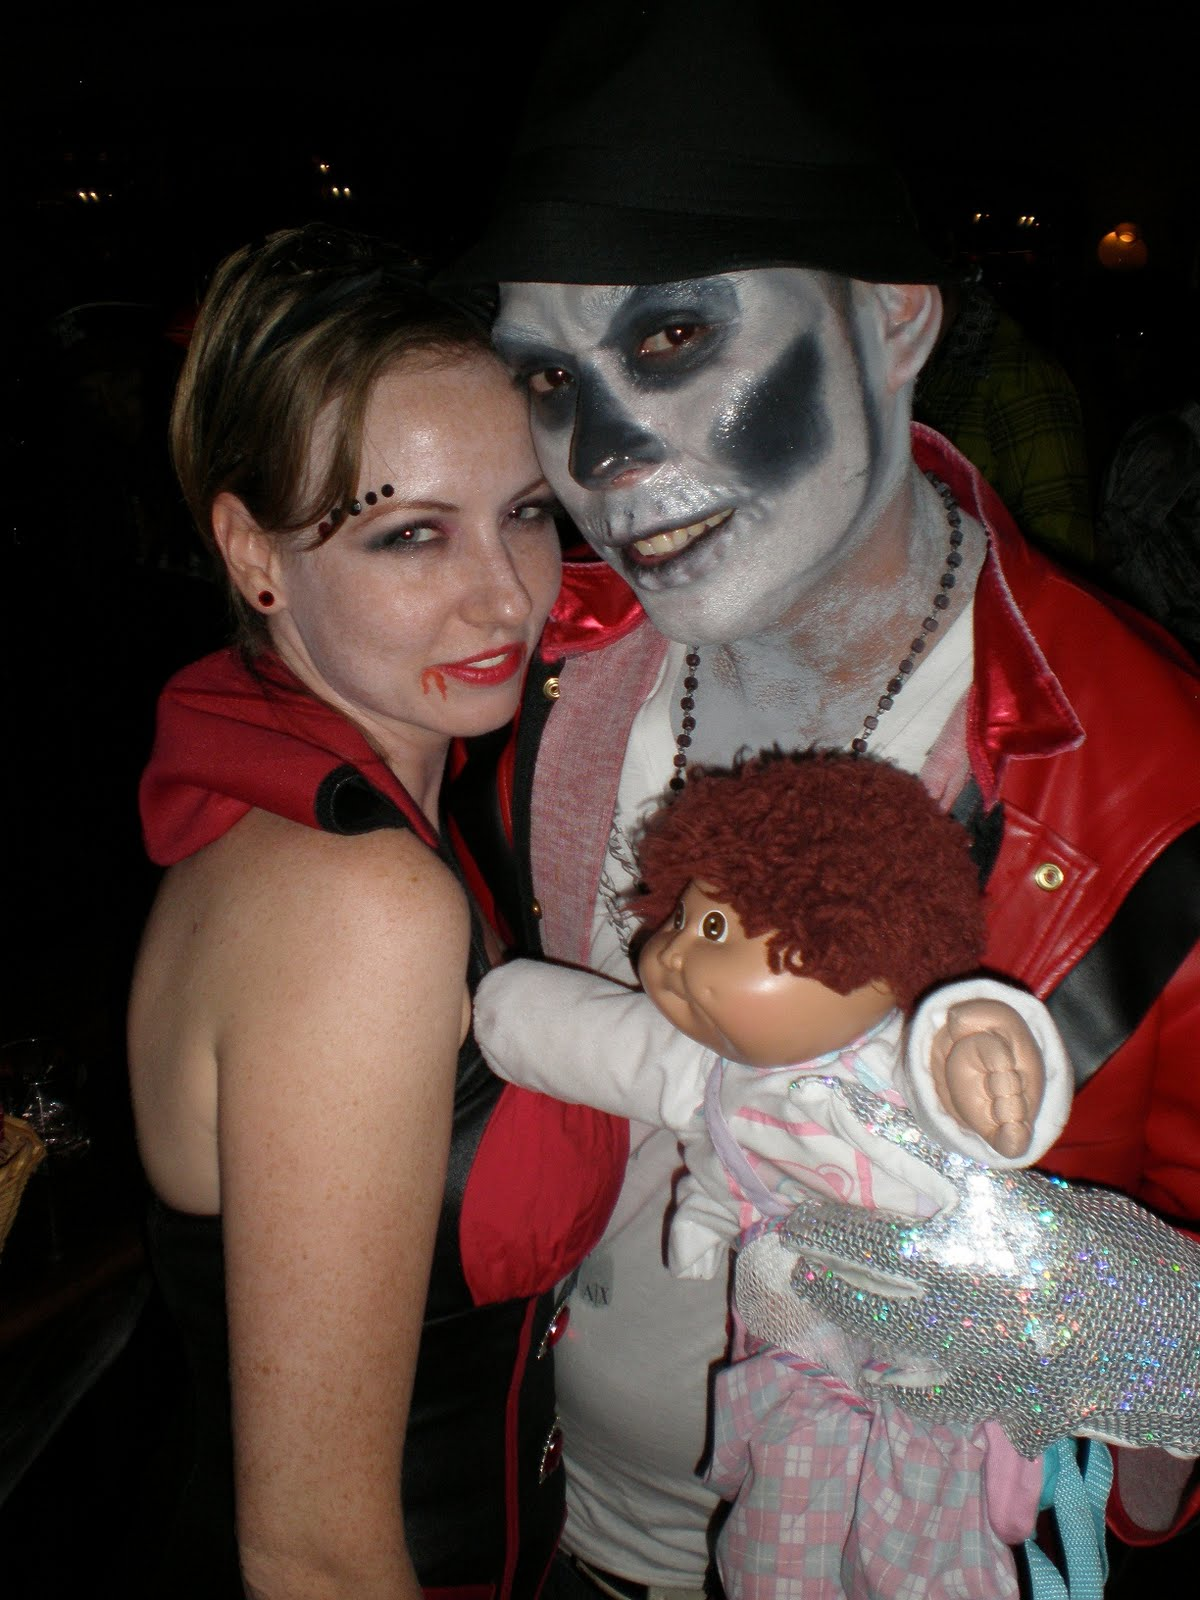 jax said: halloween wrap up 2010